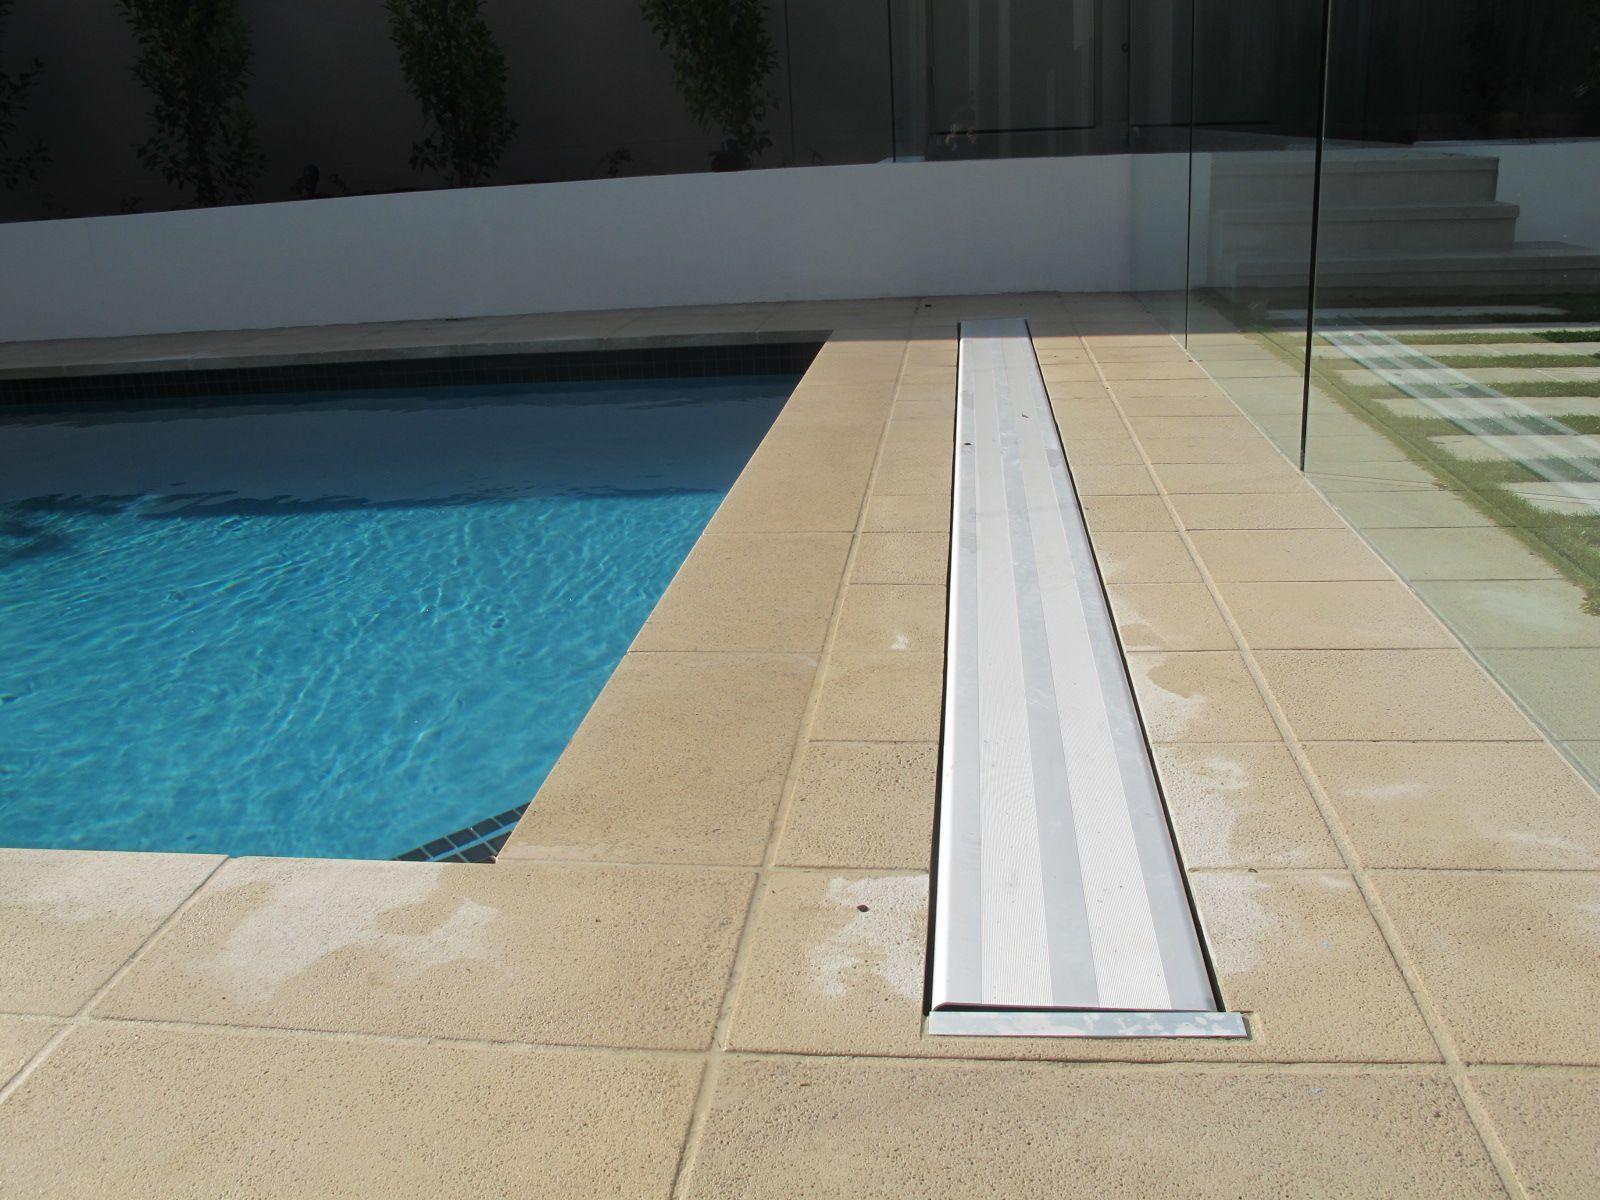 Sunbather Downunder Hidden Pool Cover Roller System Hide your